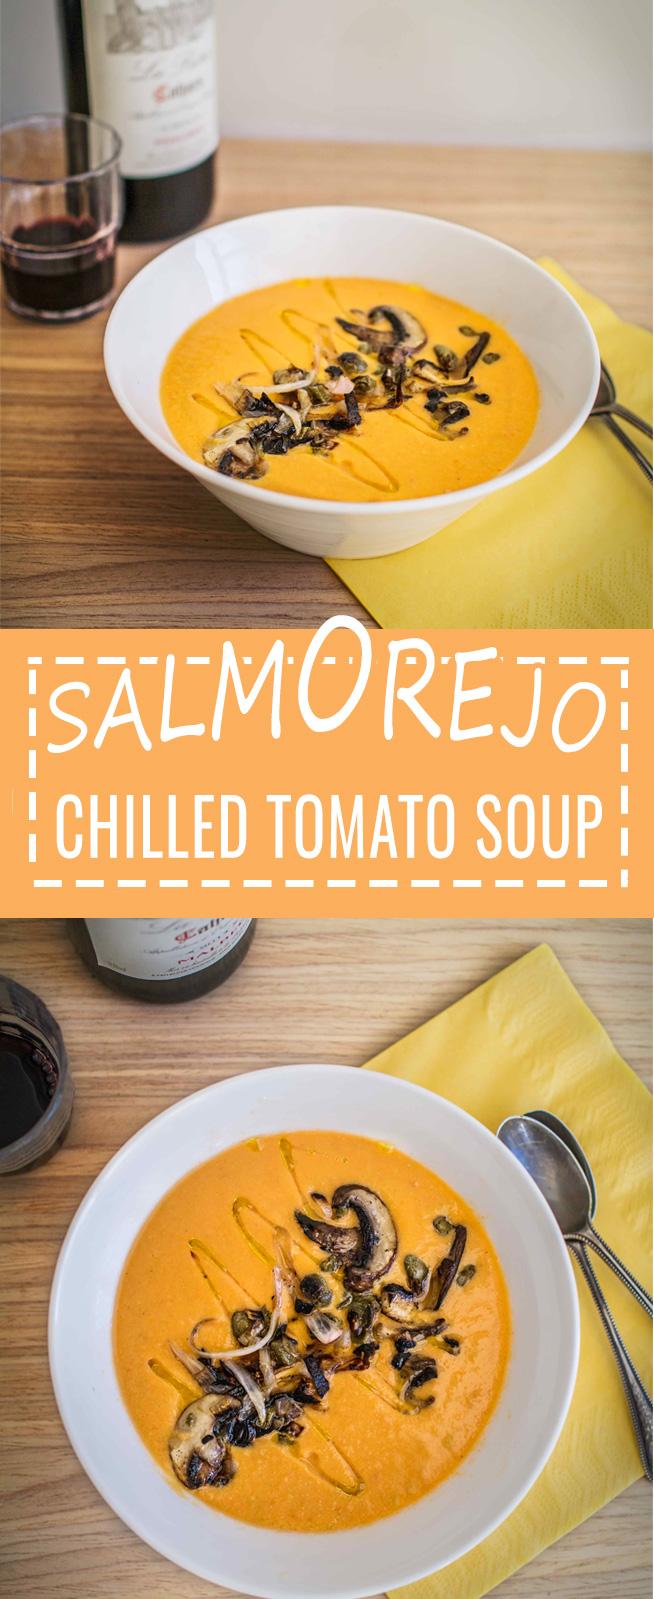 Salmorejo | www.discoverdelicious.org | vegan food